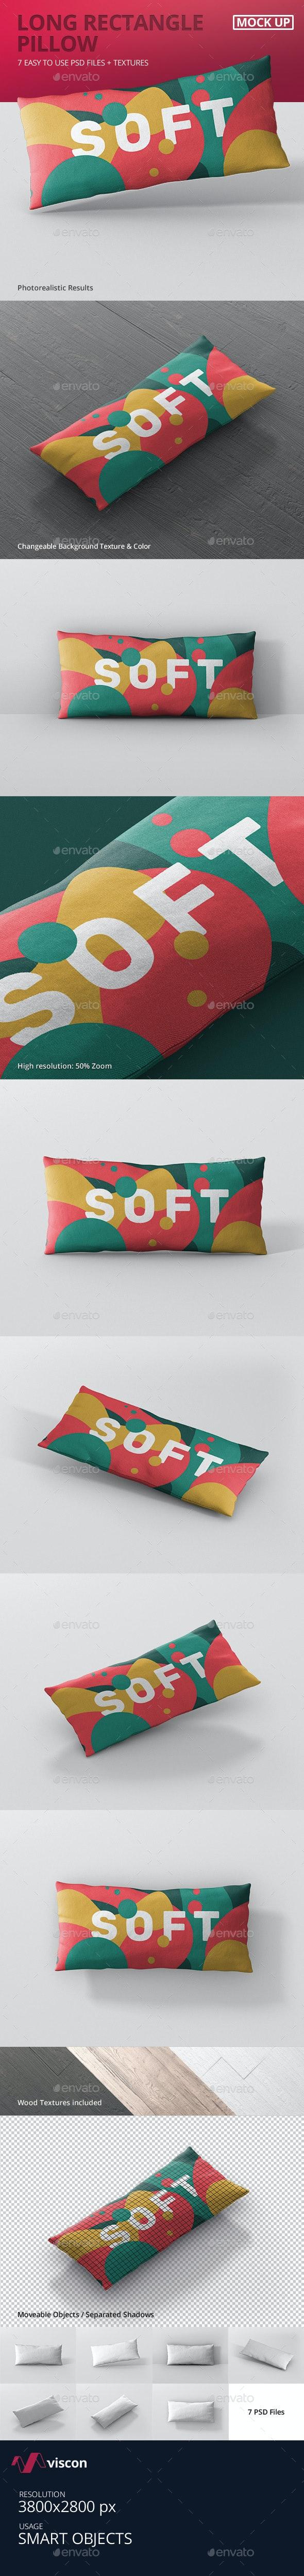 Pillow Mockup - Long Rectangle - Miscellaneous Product Mock-Ups